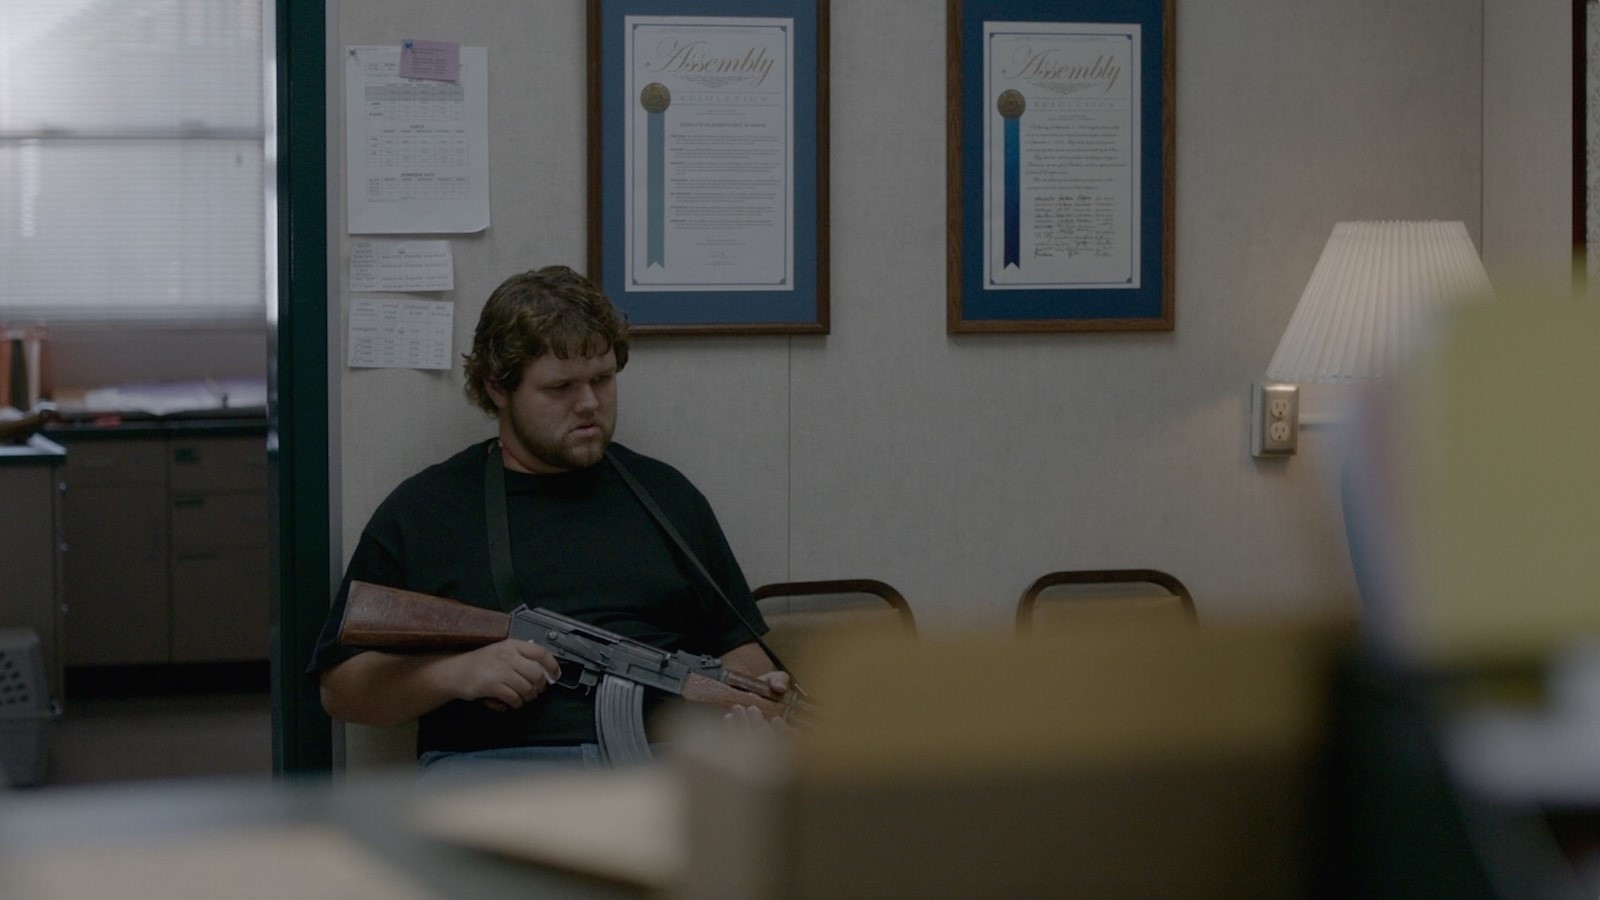 Dekalb Elementary Live Action Short Oscars 2018 predictions